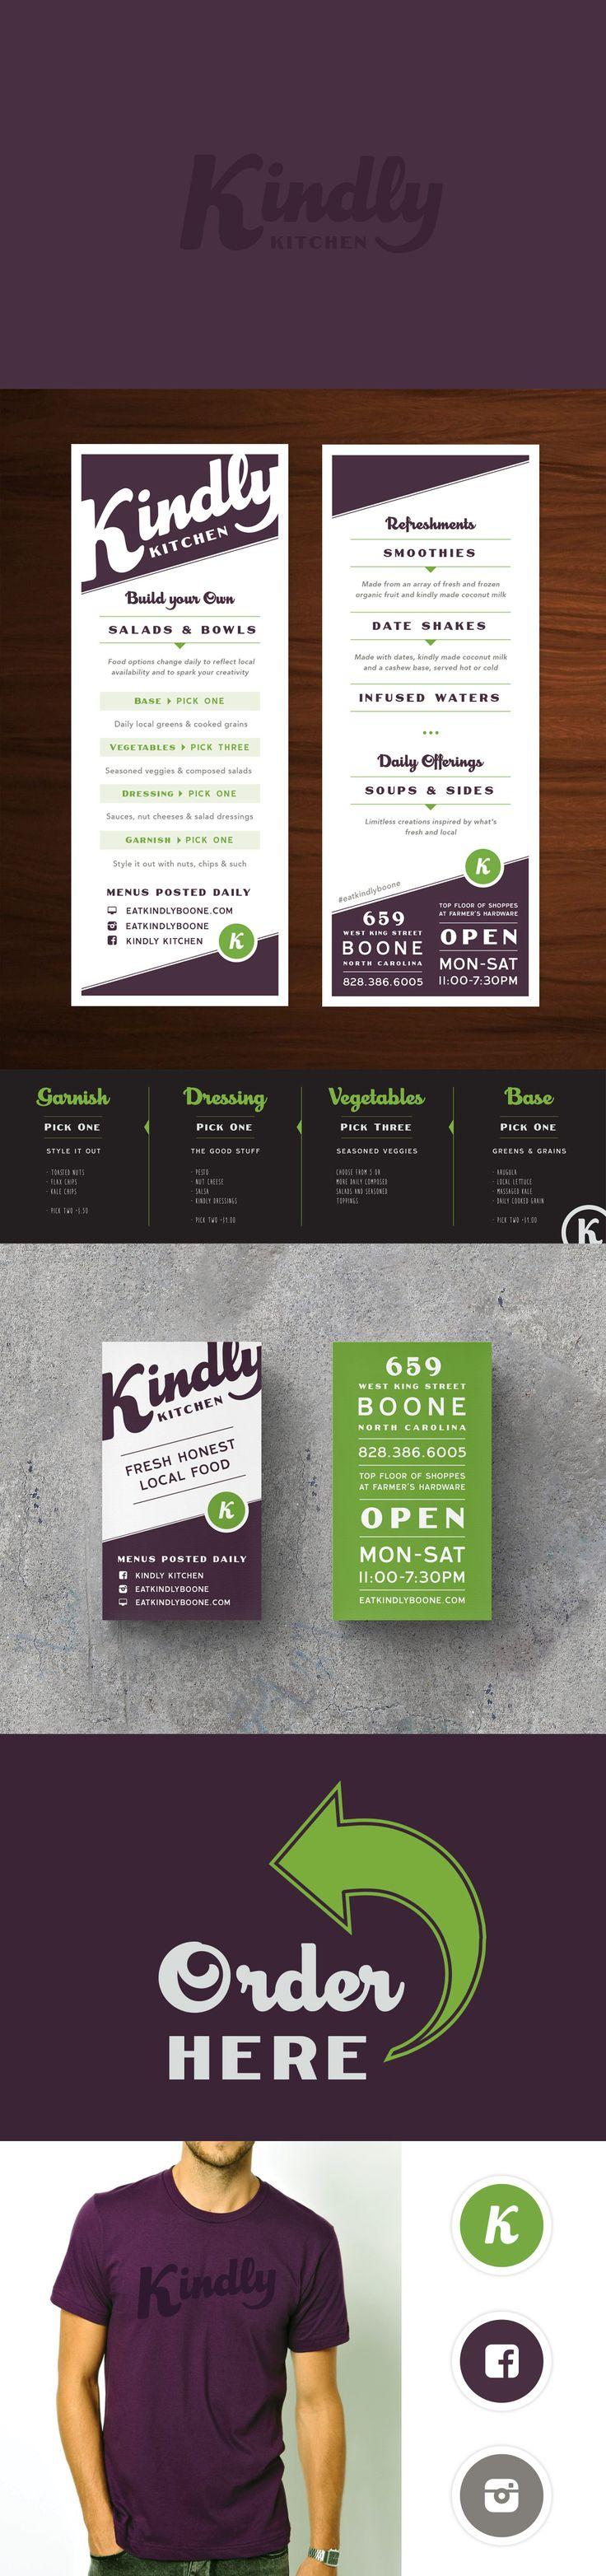 Kindly Kitchen Vegan Restaurant ~ Branding & Design by Snow in July Designs #logodesign #branding